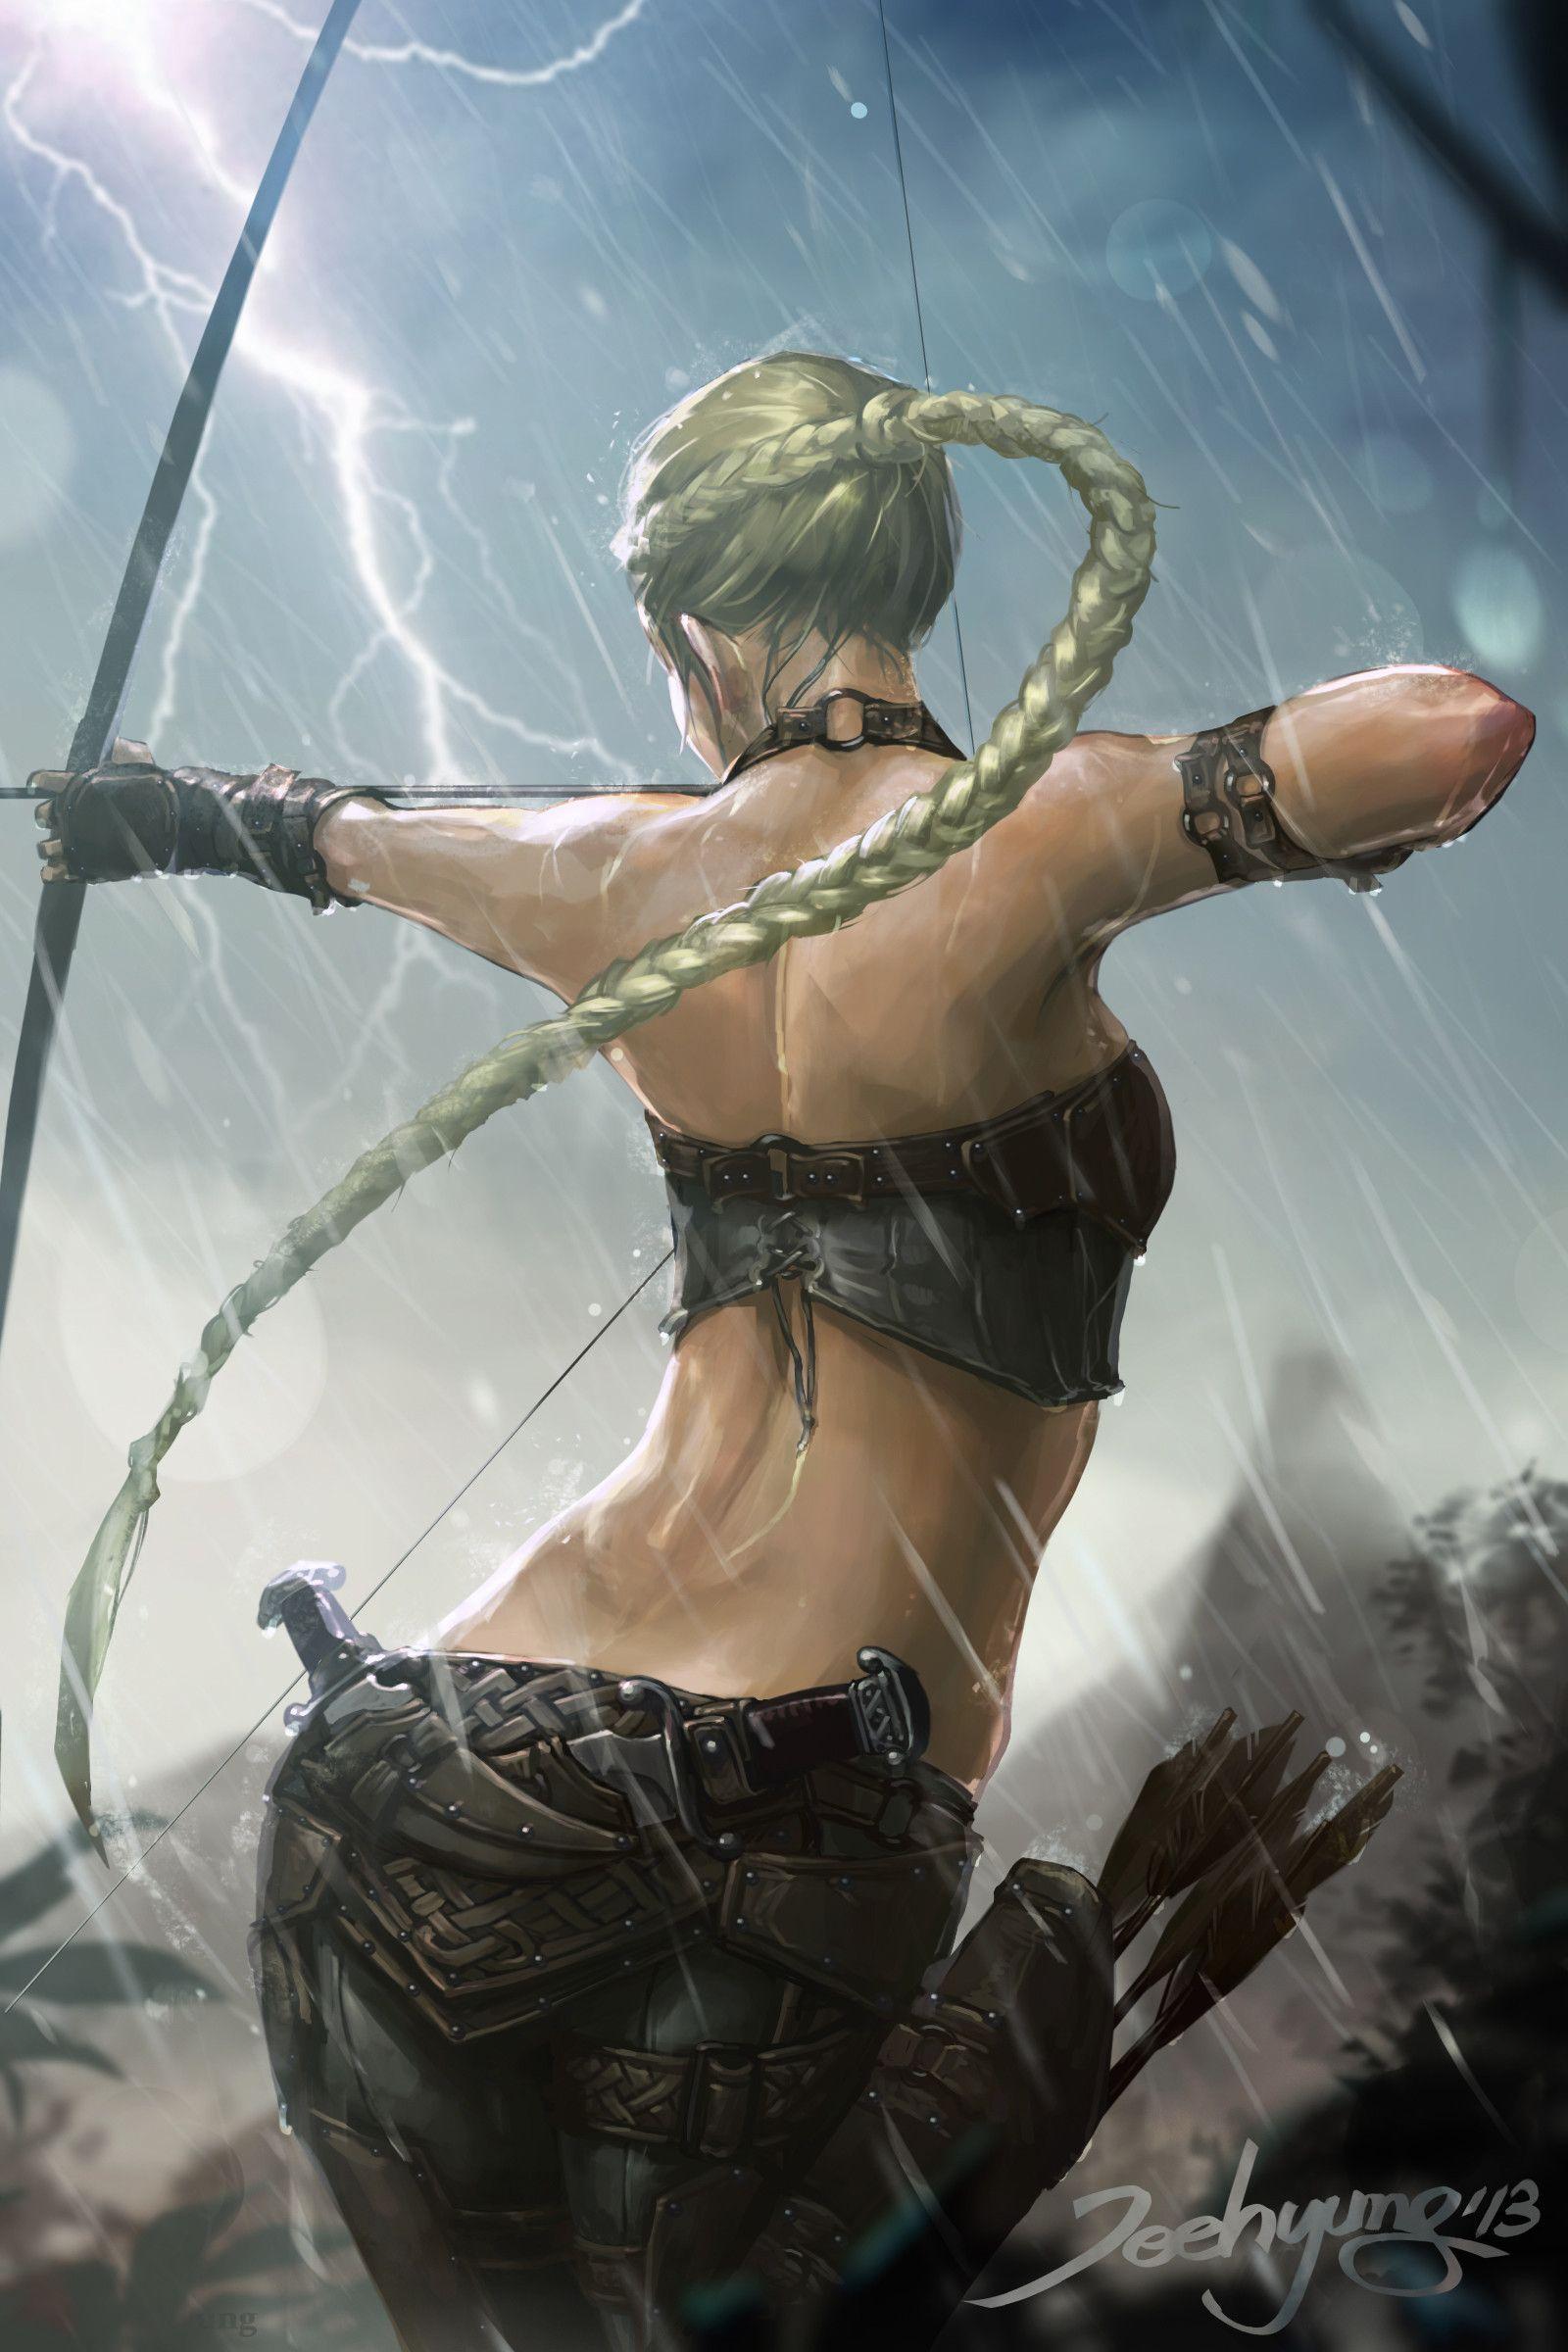 Jeehyung Jeehyung Lee Fantasy Art Fantasy Women Fantasy Warrior